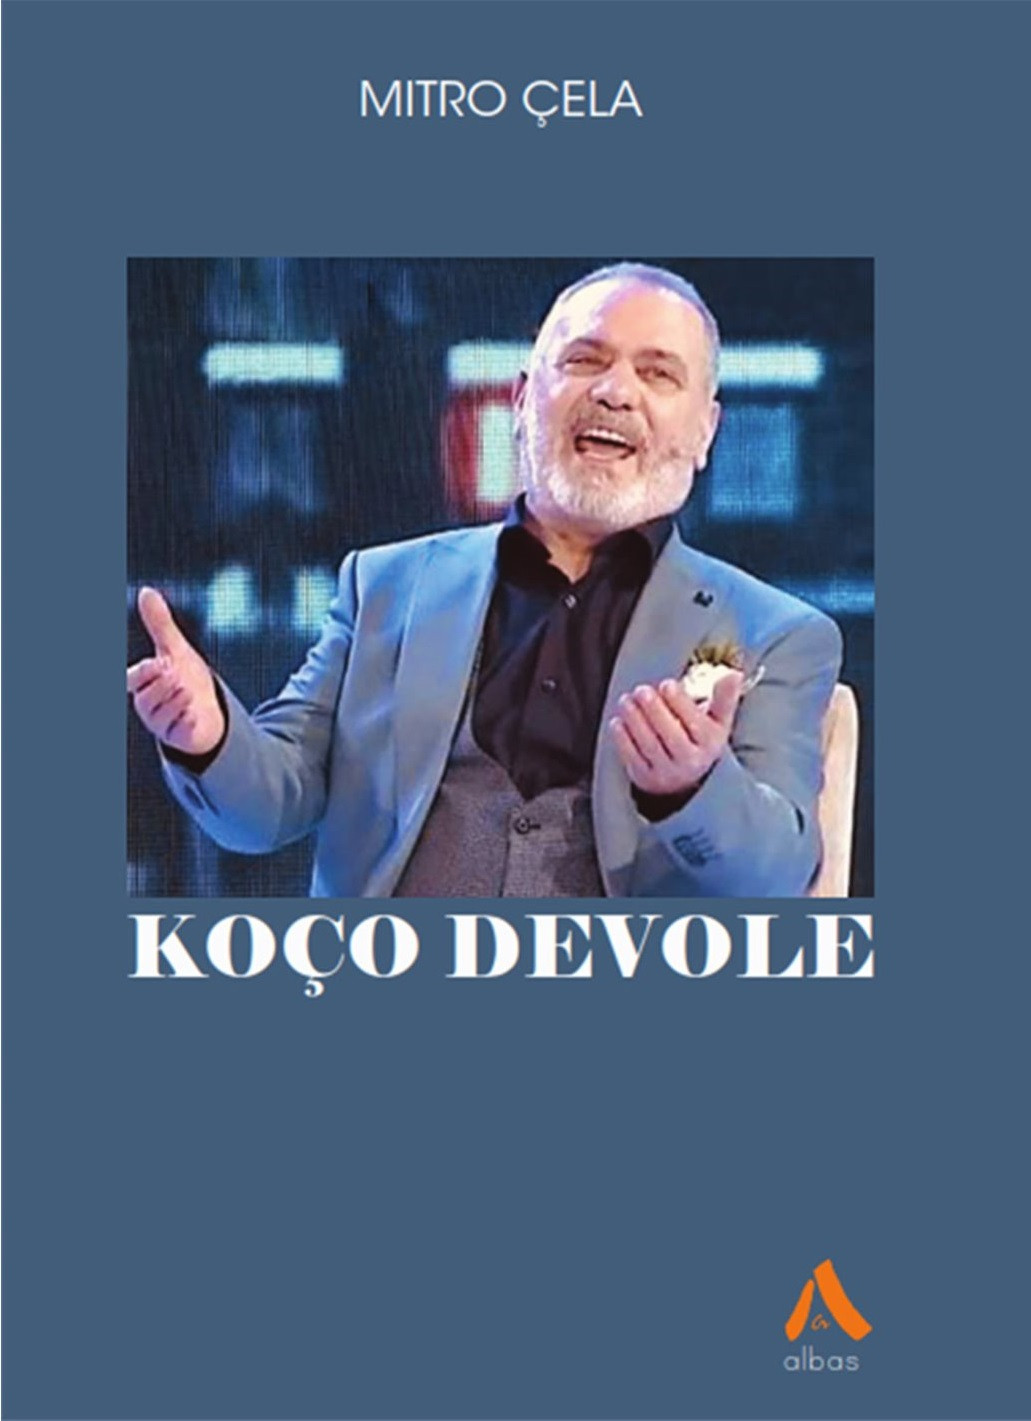 Koco Devole